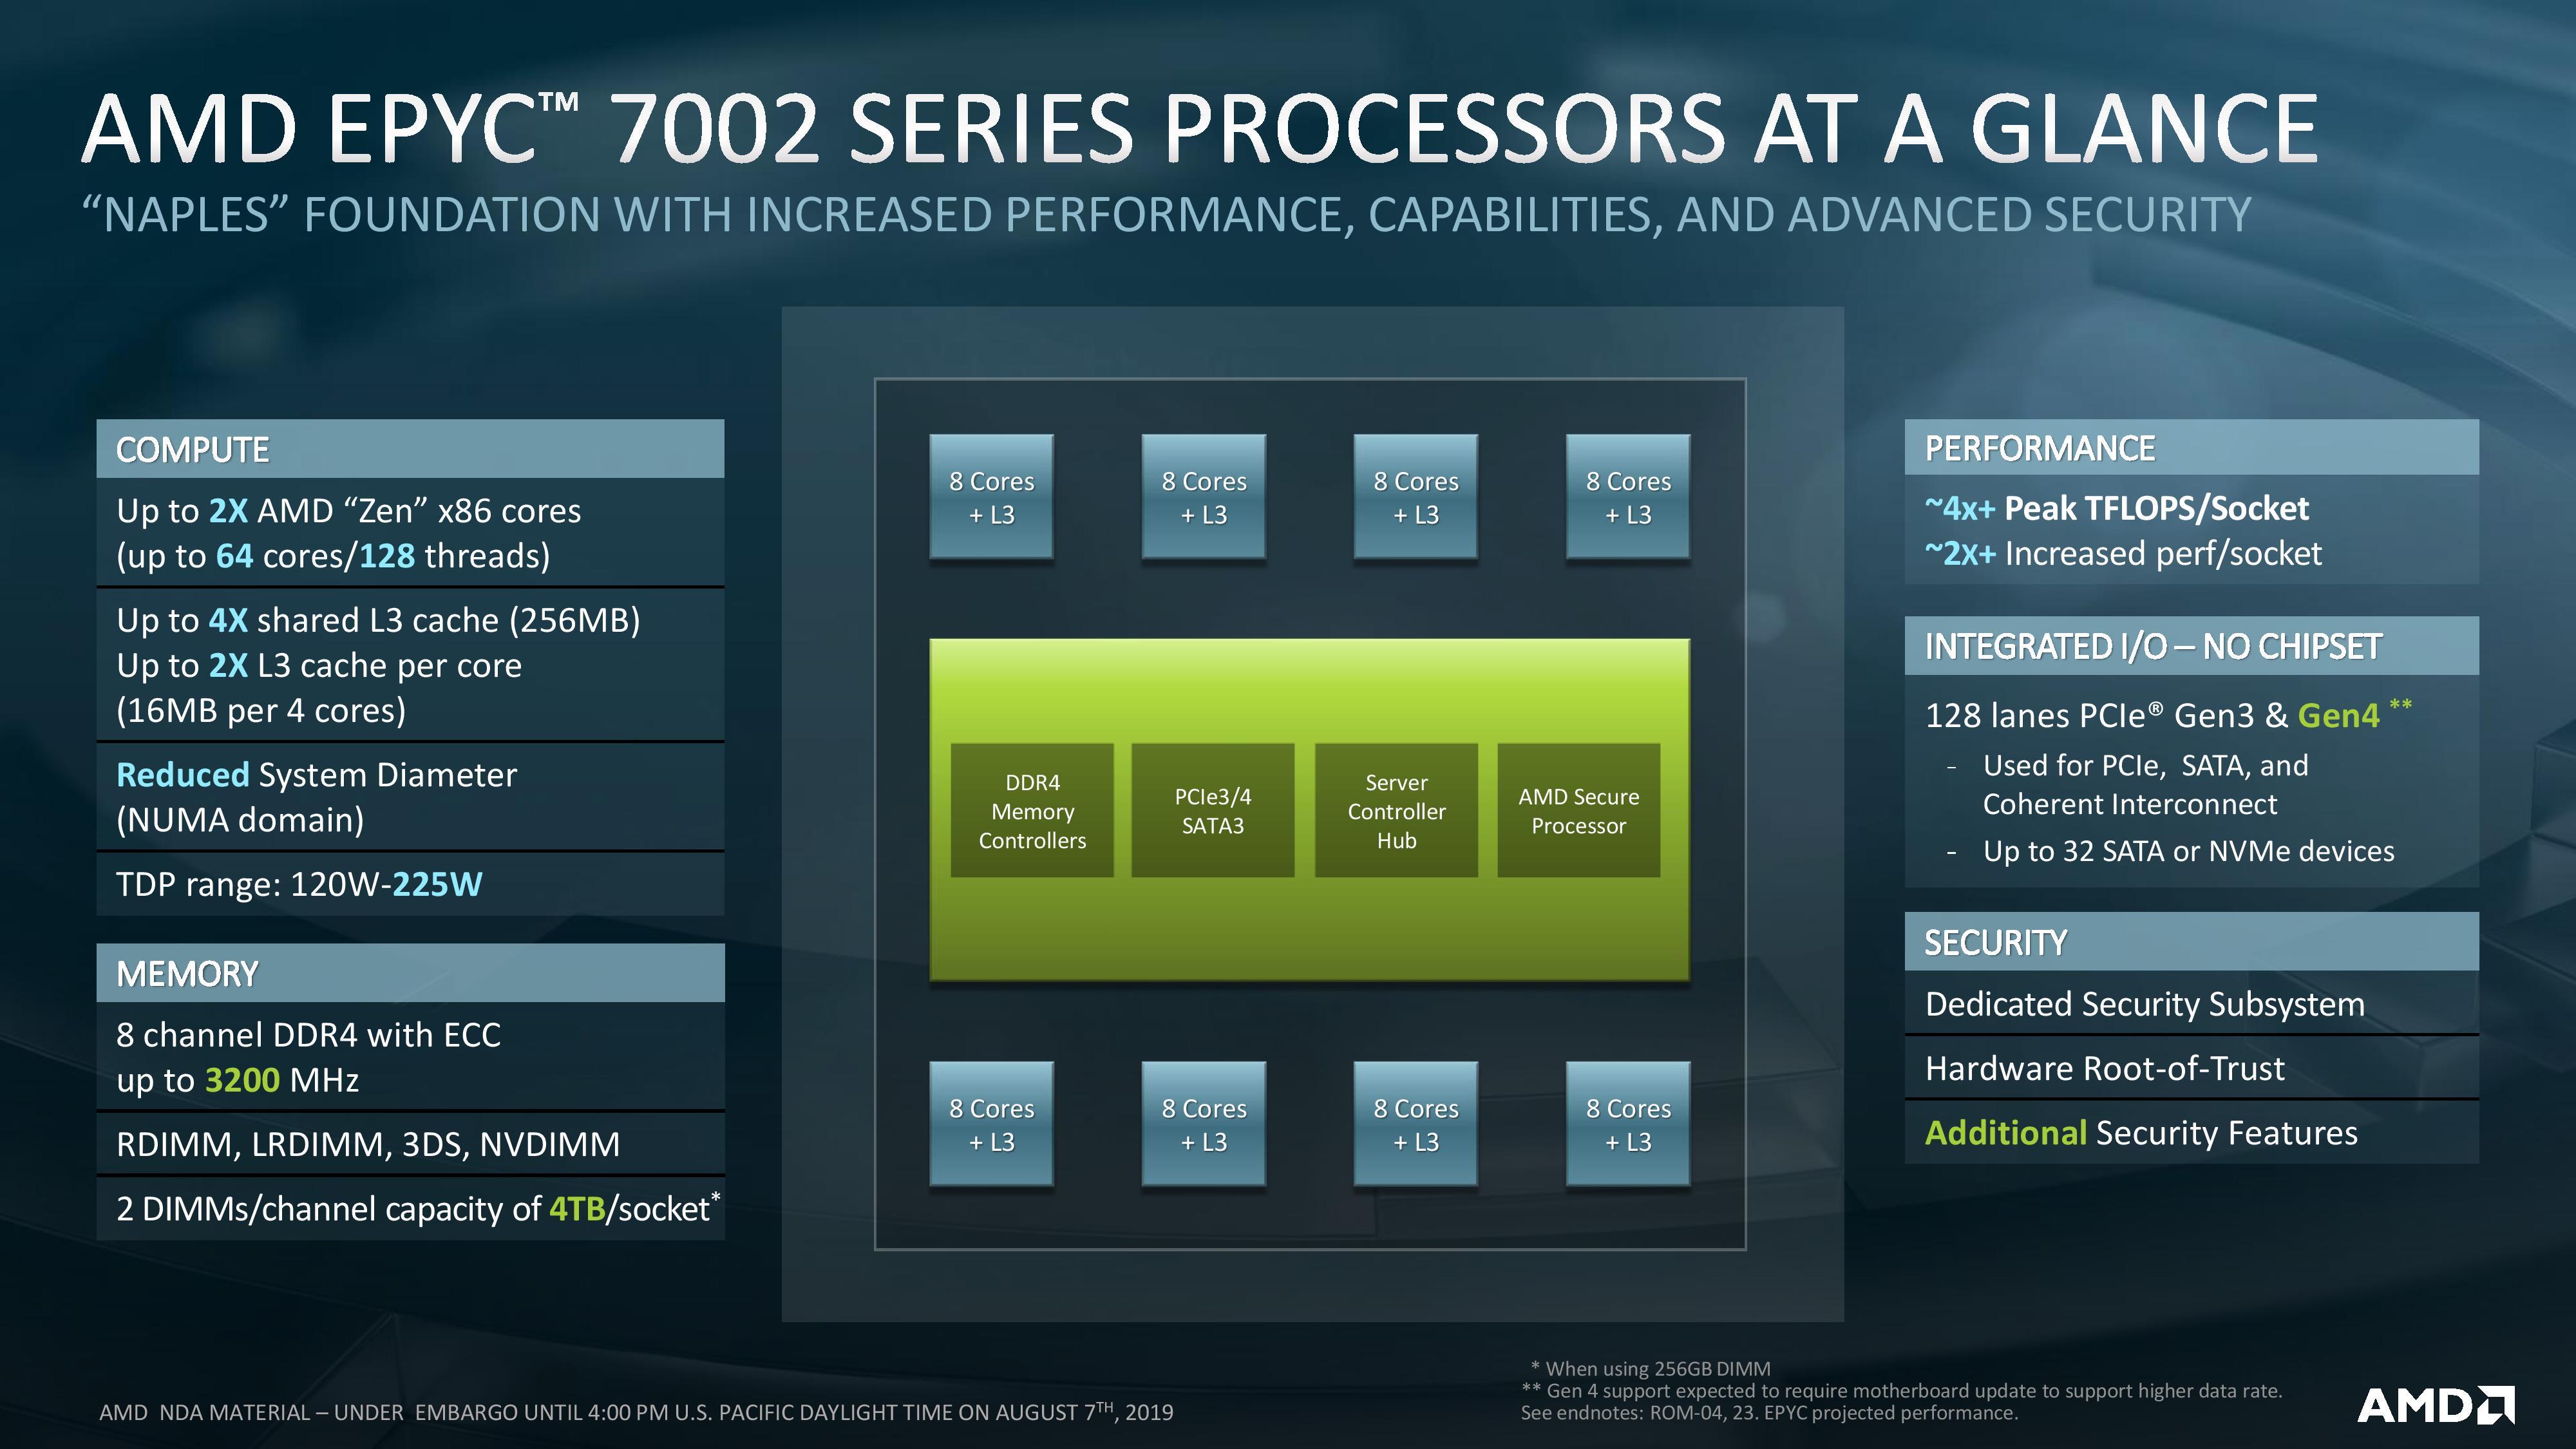 AMD EPYC Rome: The Fall of the Intel Empire